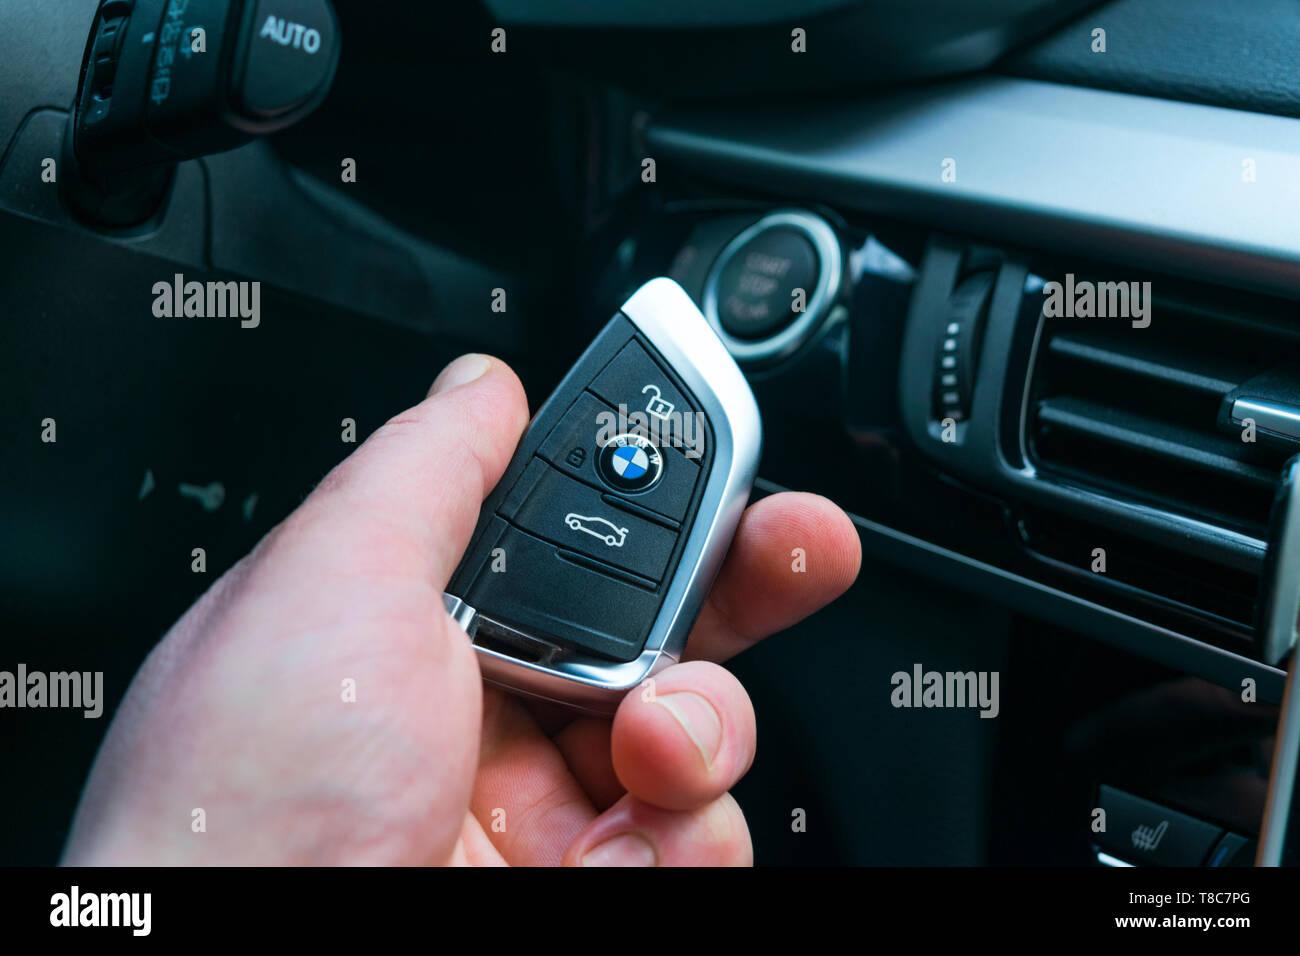 Sankt-Petersburg, Russia, November 16, 2017: BMW X5 F15 start car key in a male hand near start/stop push button. Modern car interior details. The key - Stock Image